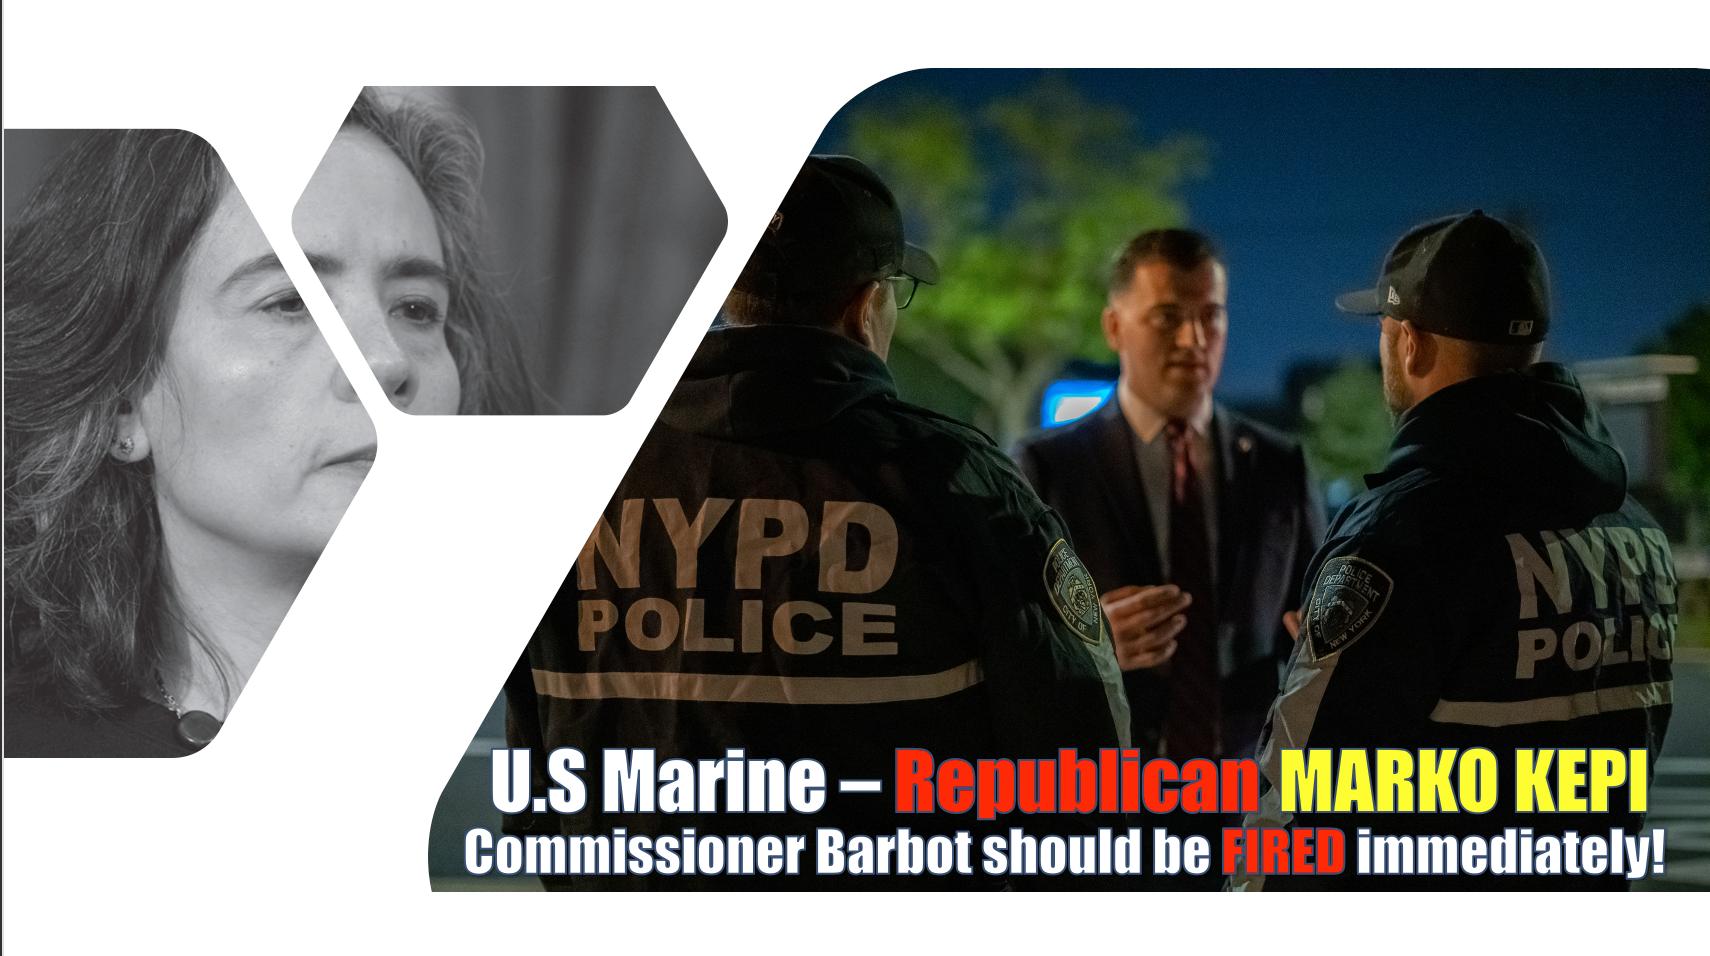 U.S Marine Marko Kepi – FIRE Barbot!